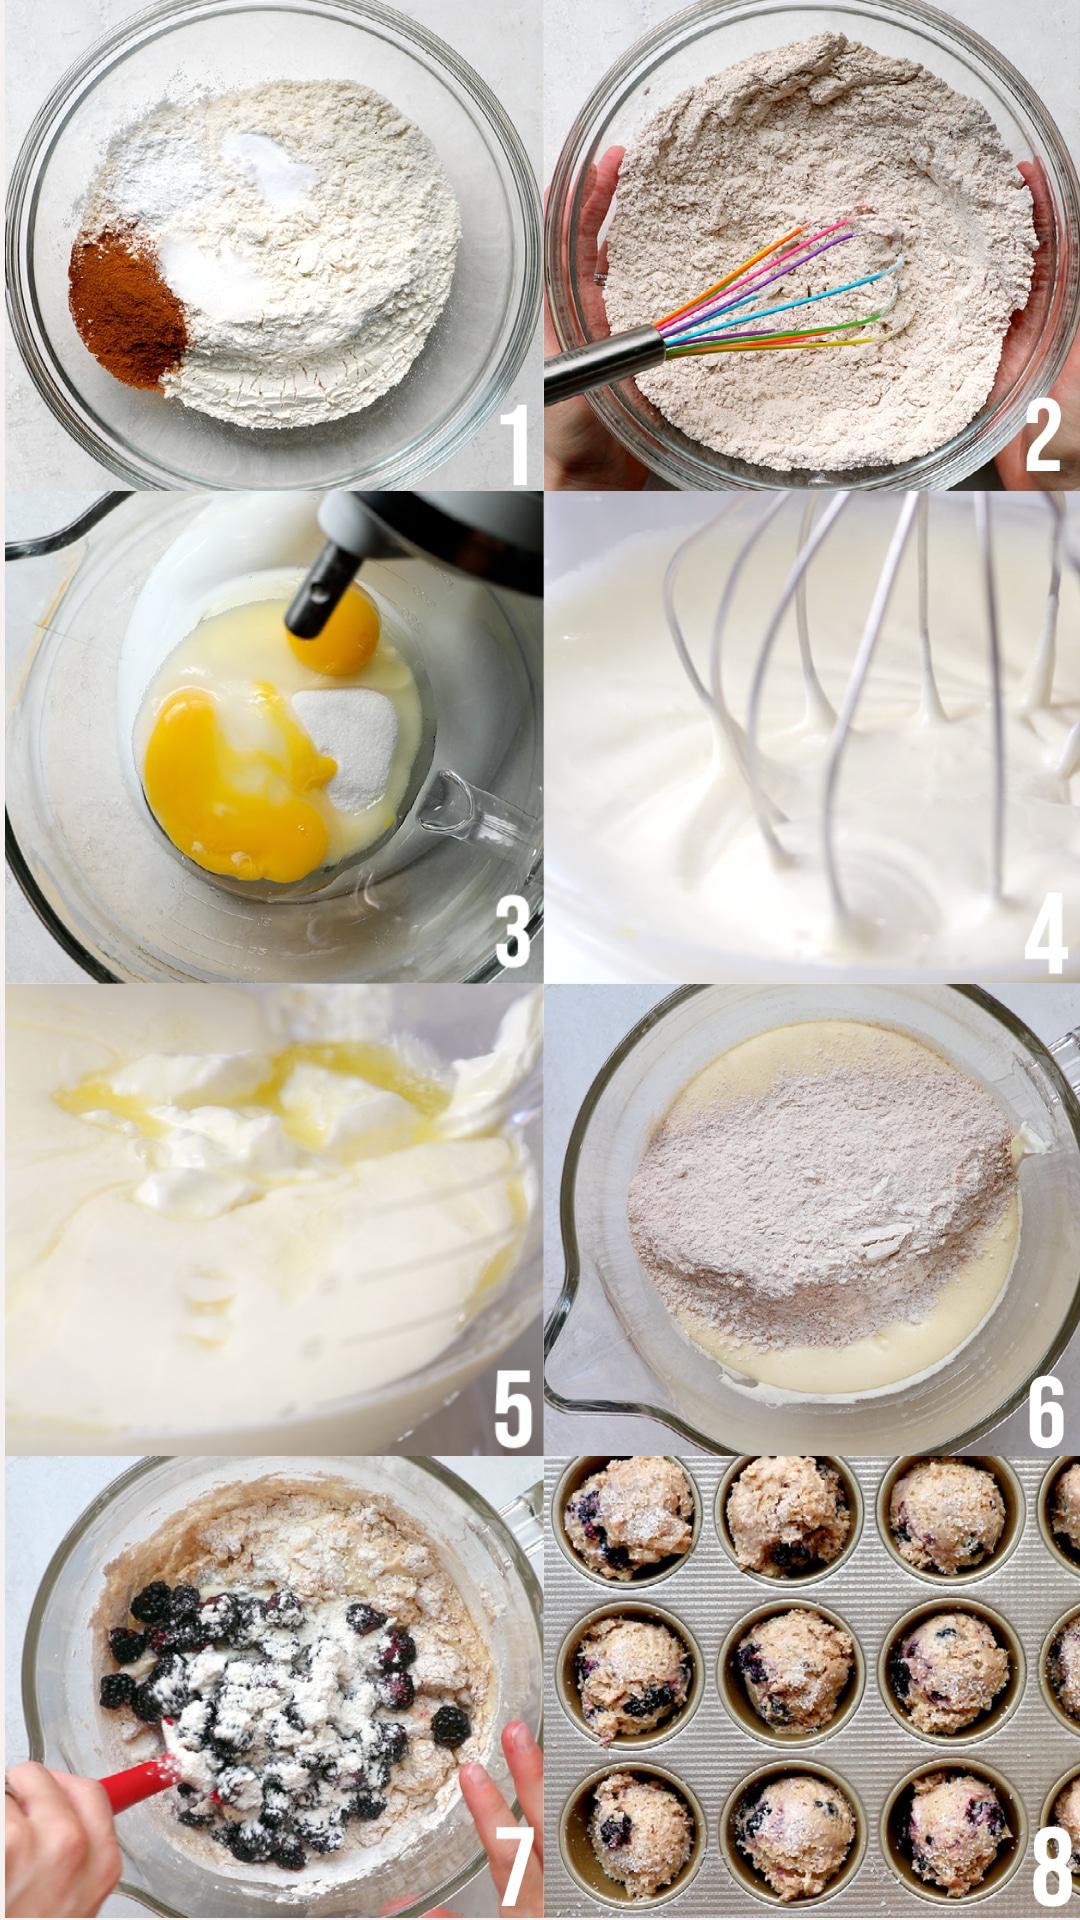 photos making blackberry muffins